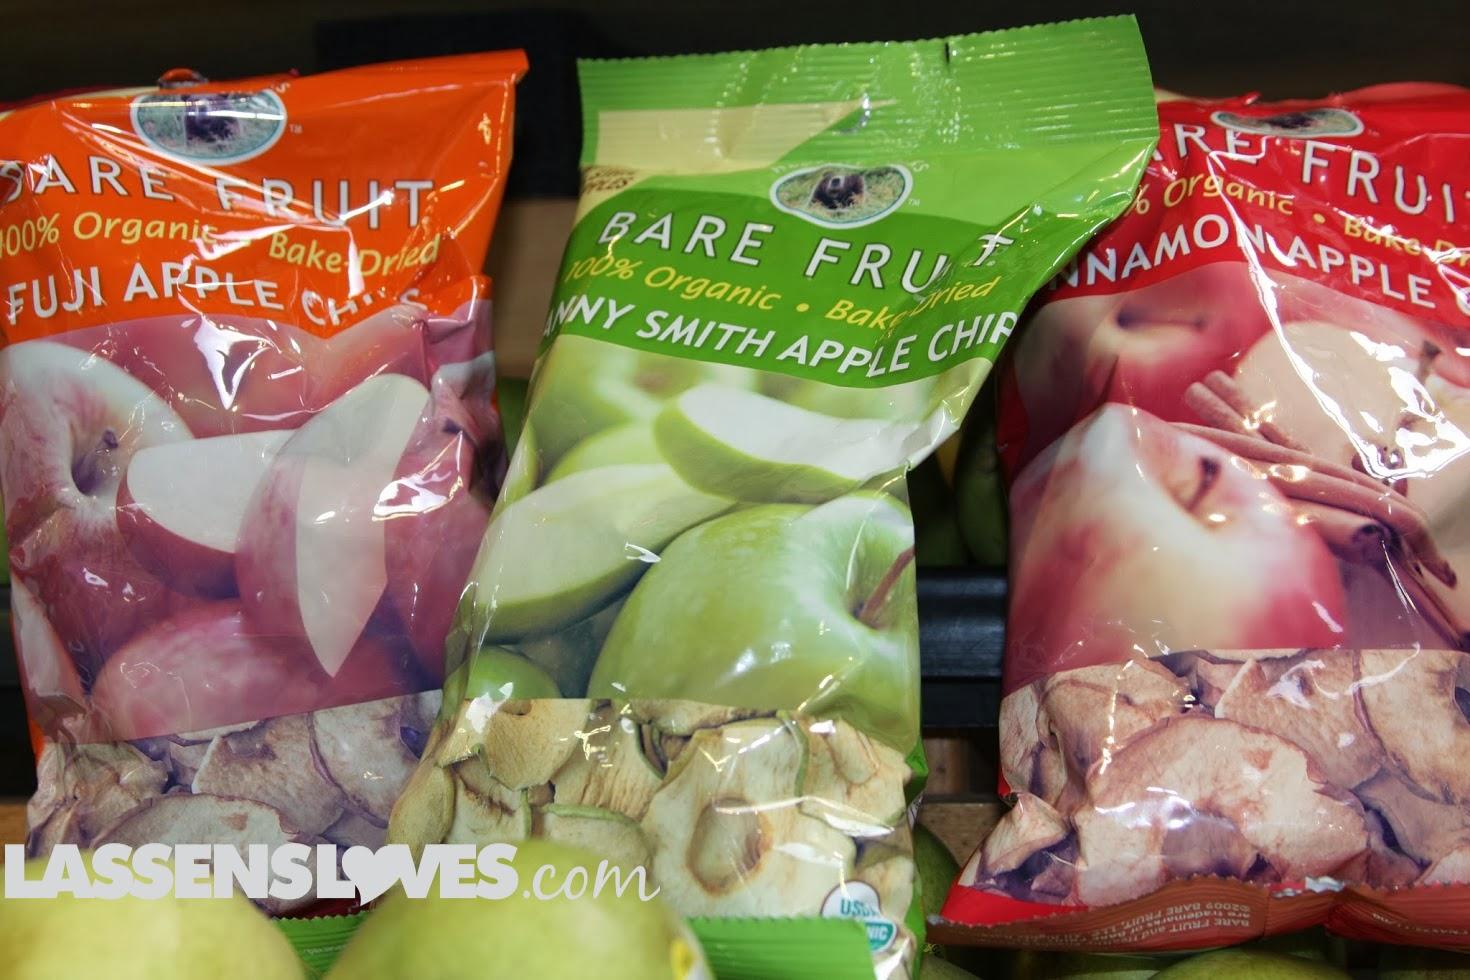 lassensloves.com, Lassen's, Lassens, Manager+Spotlight, Bare+Fruit